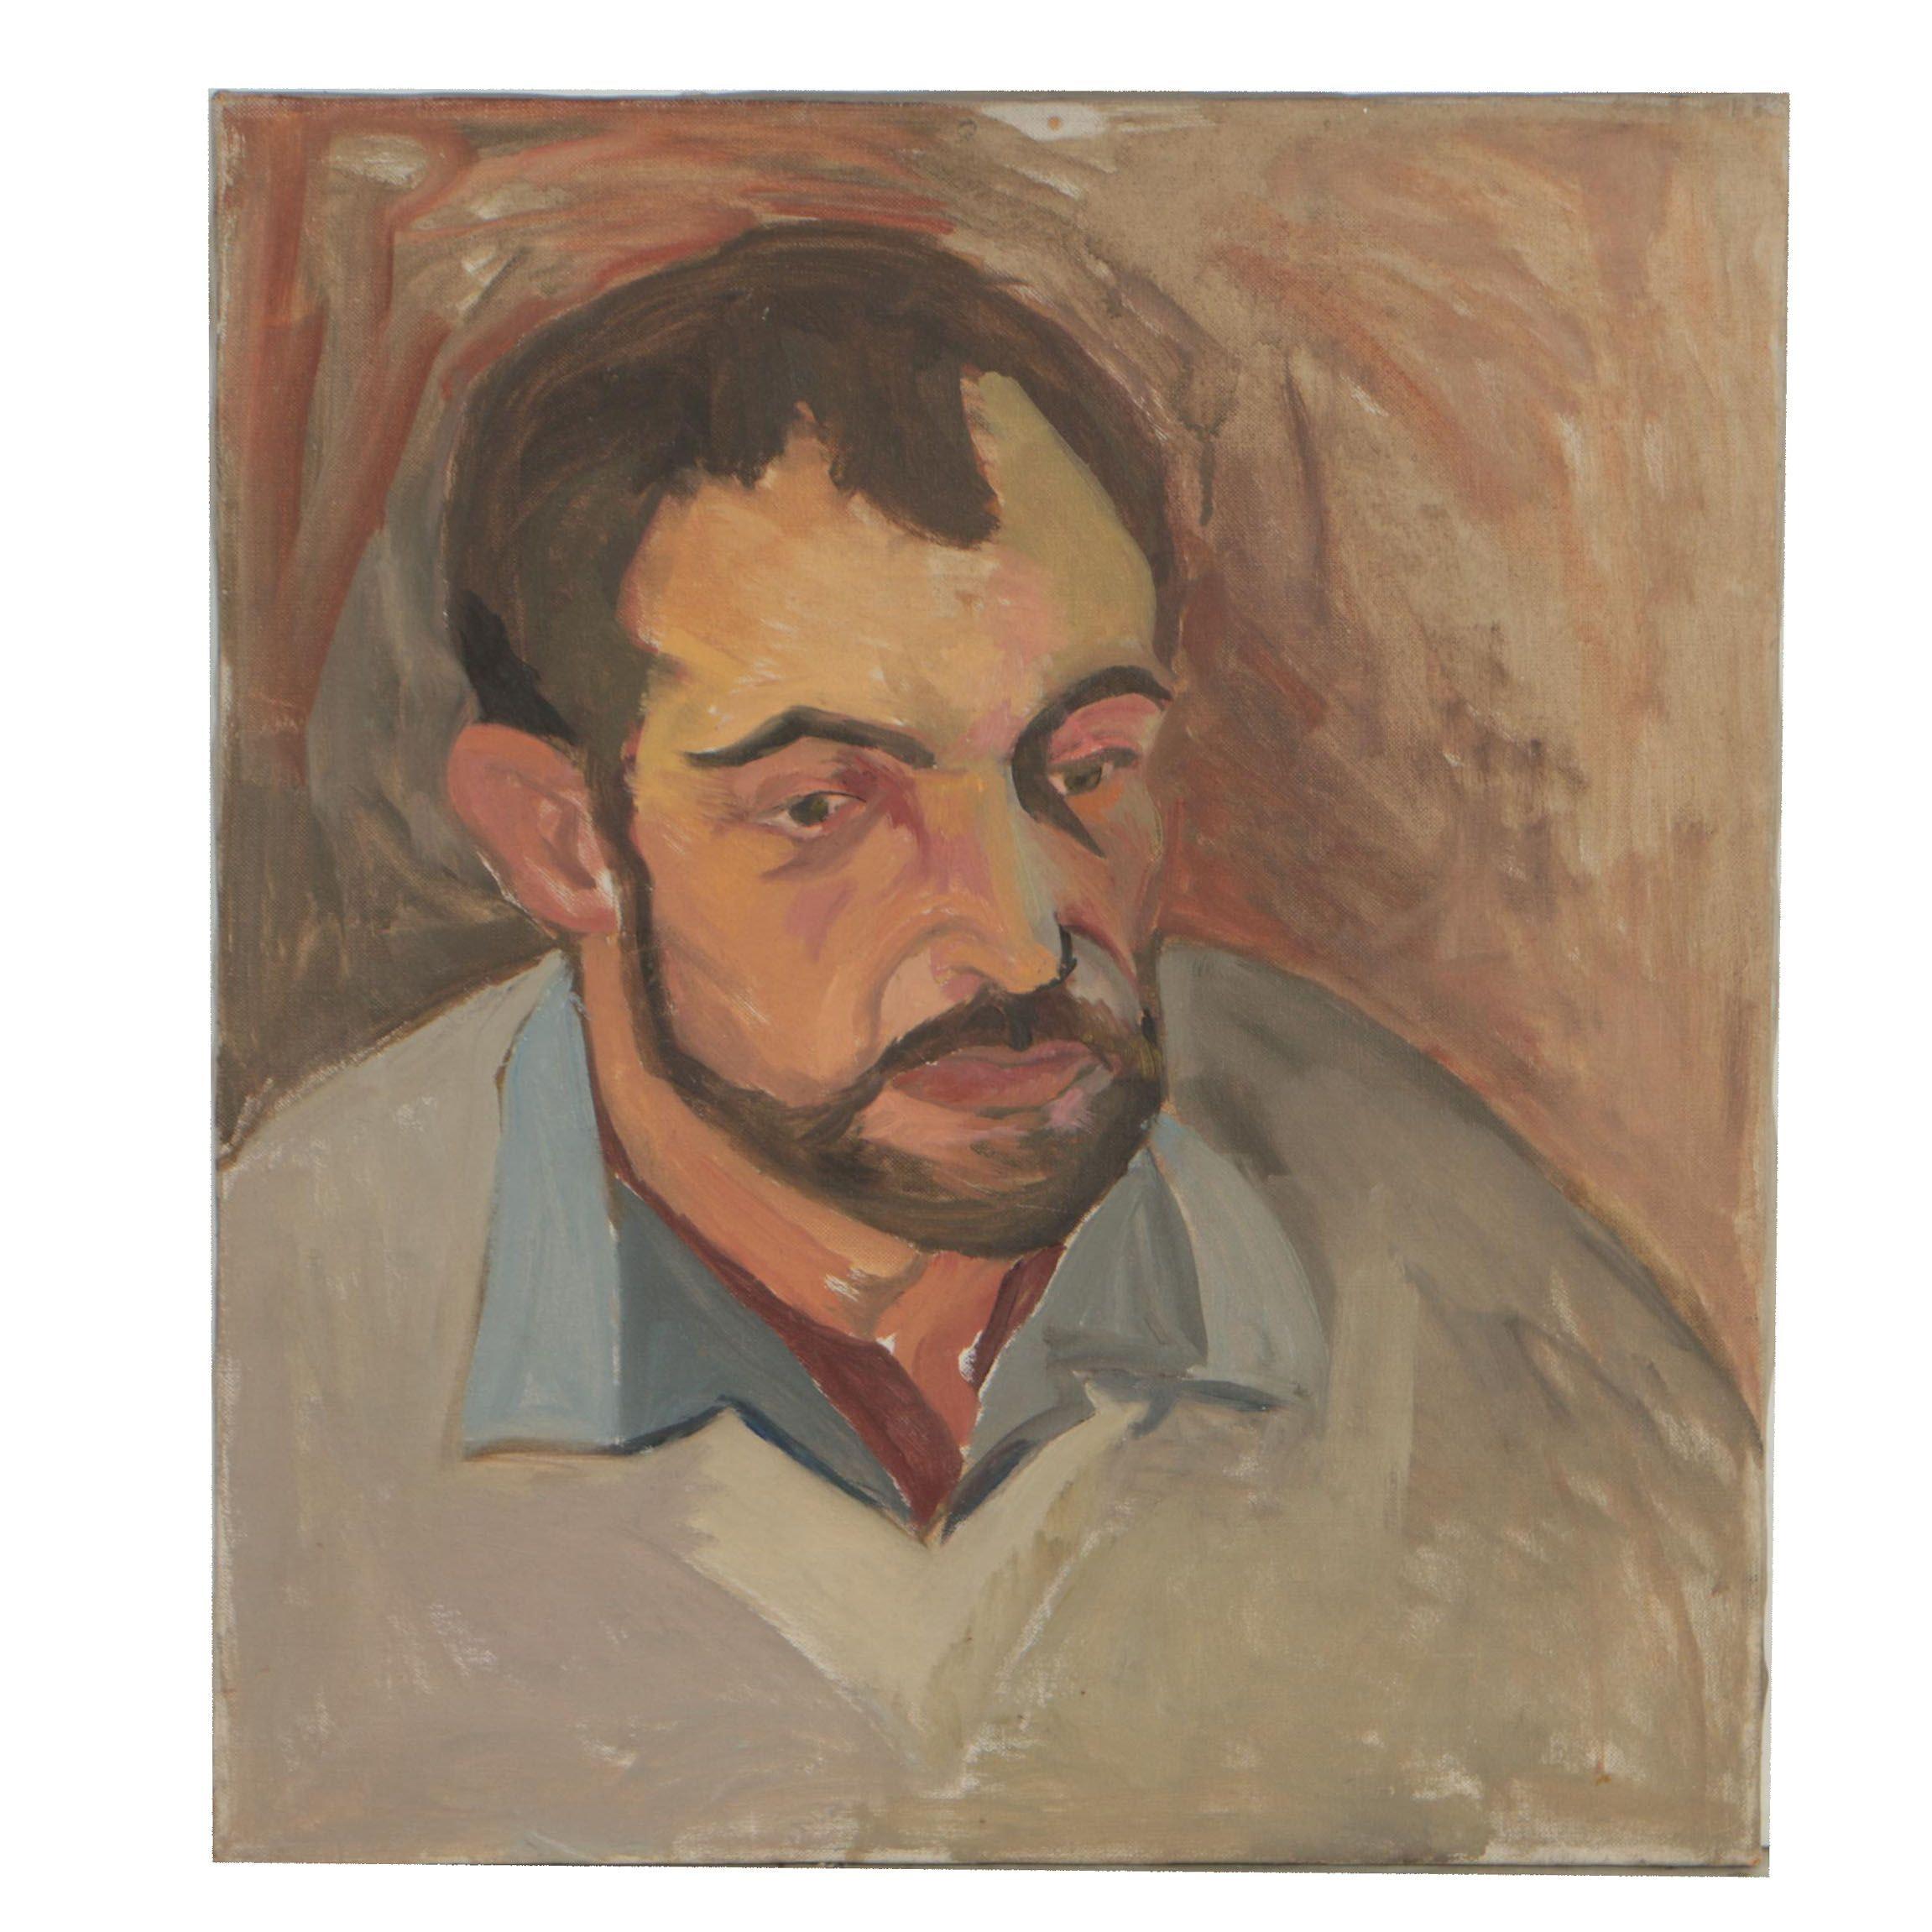 Late 20th Century Oil Portrait of Pensive Man